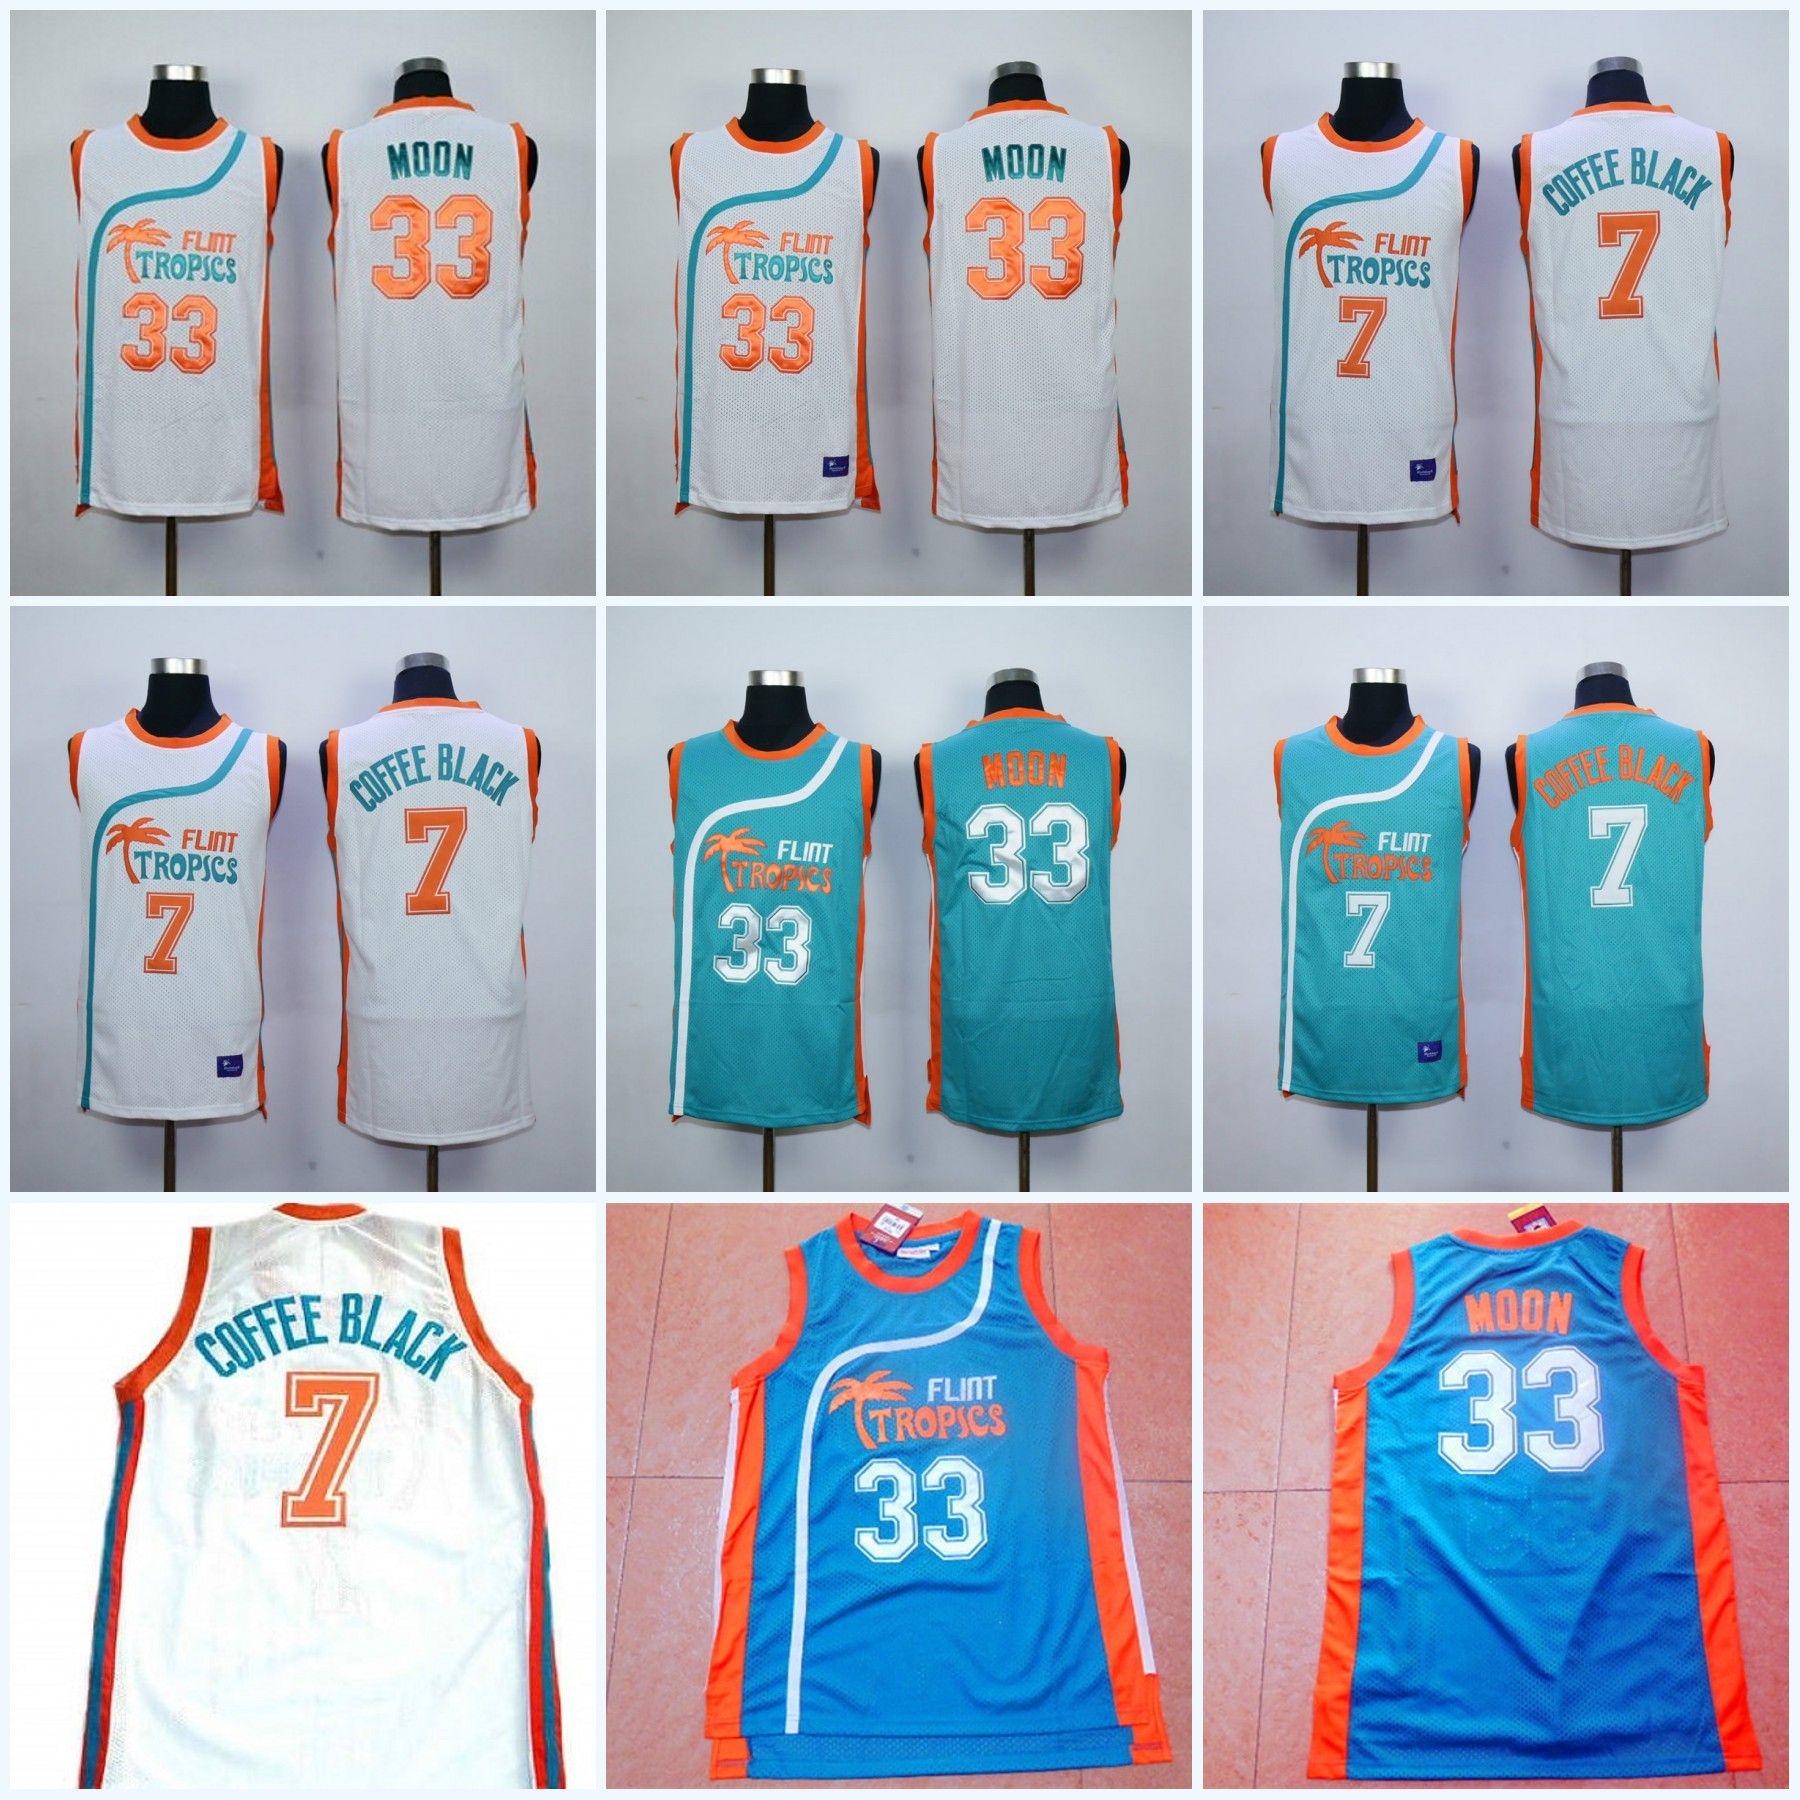 2019 Flint Tropics Semi Pro Movie Jerseys 33 Jackie Moon 7 Coffee Black 11  Ed Monix Basketball Jerseys All Stitched From Projerseyworld 2e4a23a5c